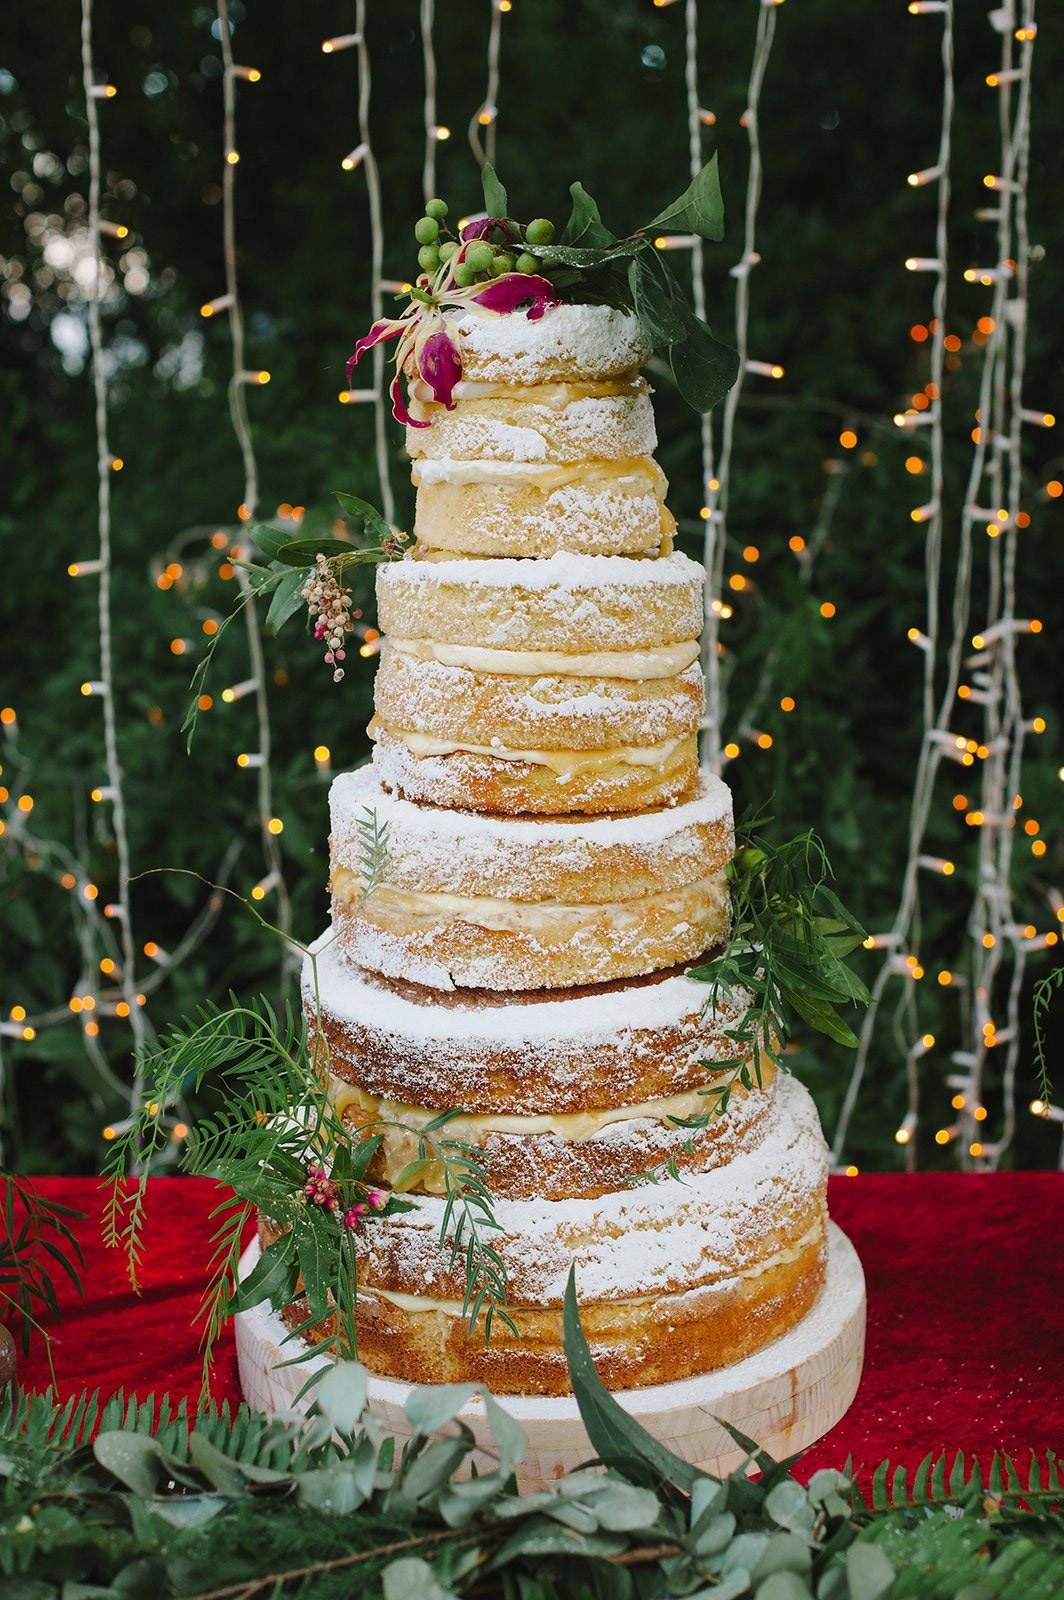 The Best Wedding Cakes  The Best Wedding Cakes in Vogue Vogue